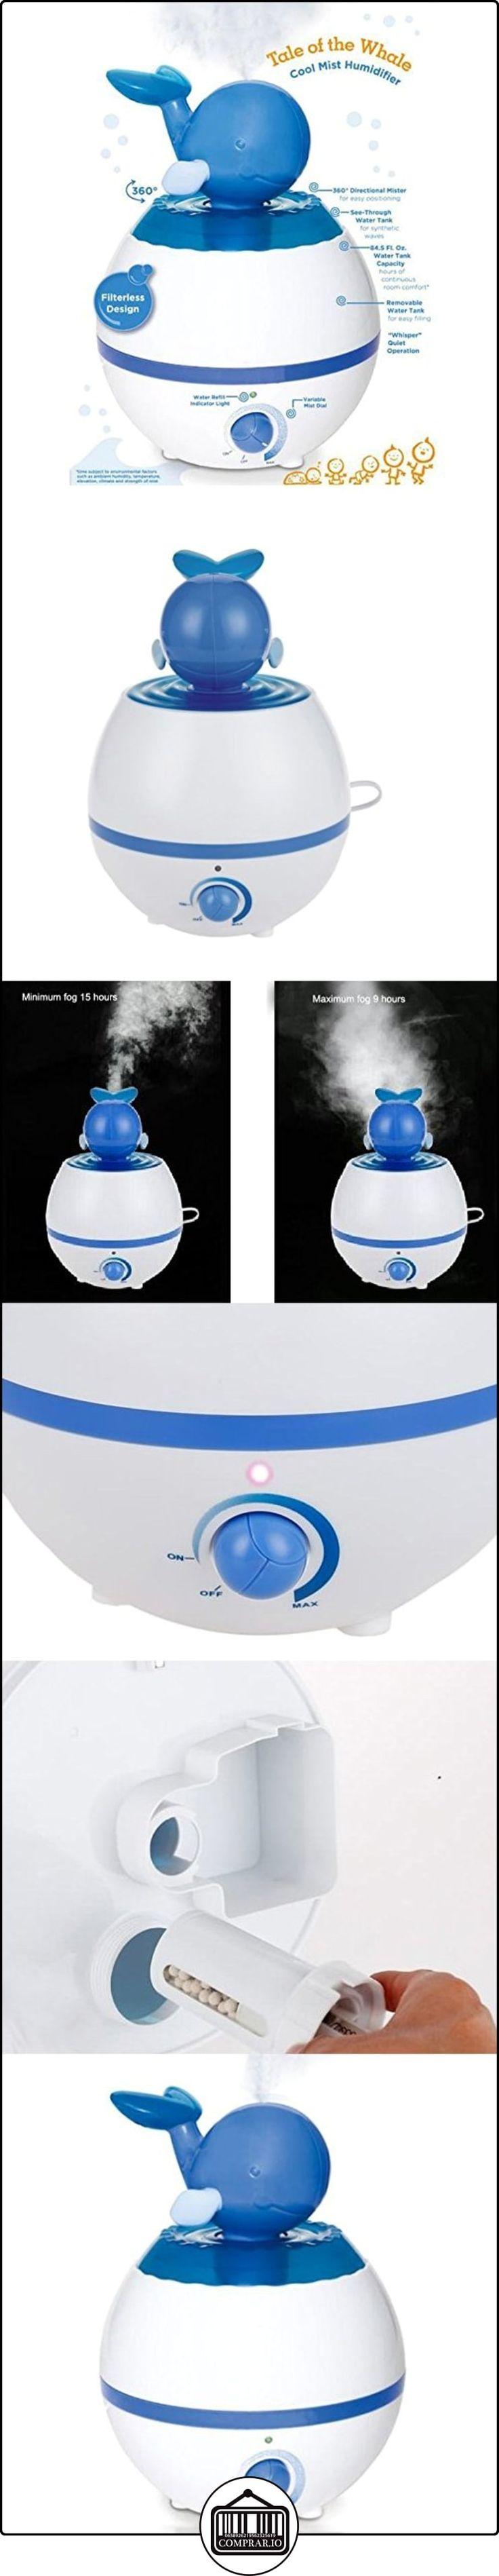 Sucolin humidificadores D Air bebé sónico ballena azul  ✿ Seguridad para tu bebé - (Protege a tus hijos) ✿ ▬► Ver oferta: http://comprar.io/goto/B01FS6IV0Q